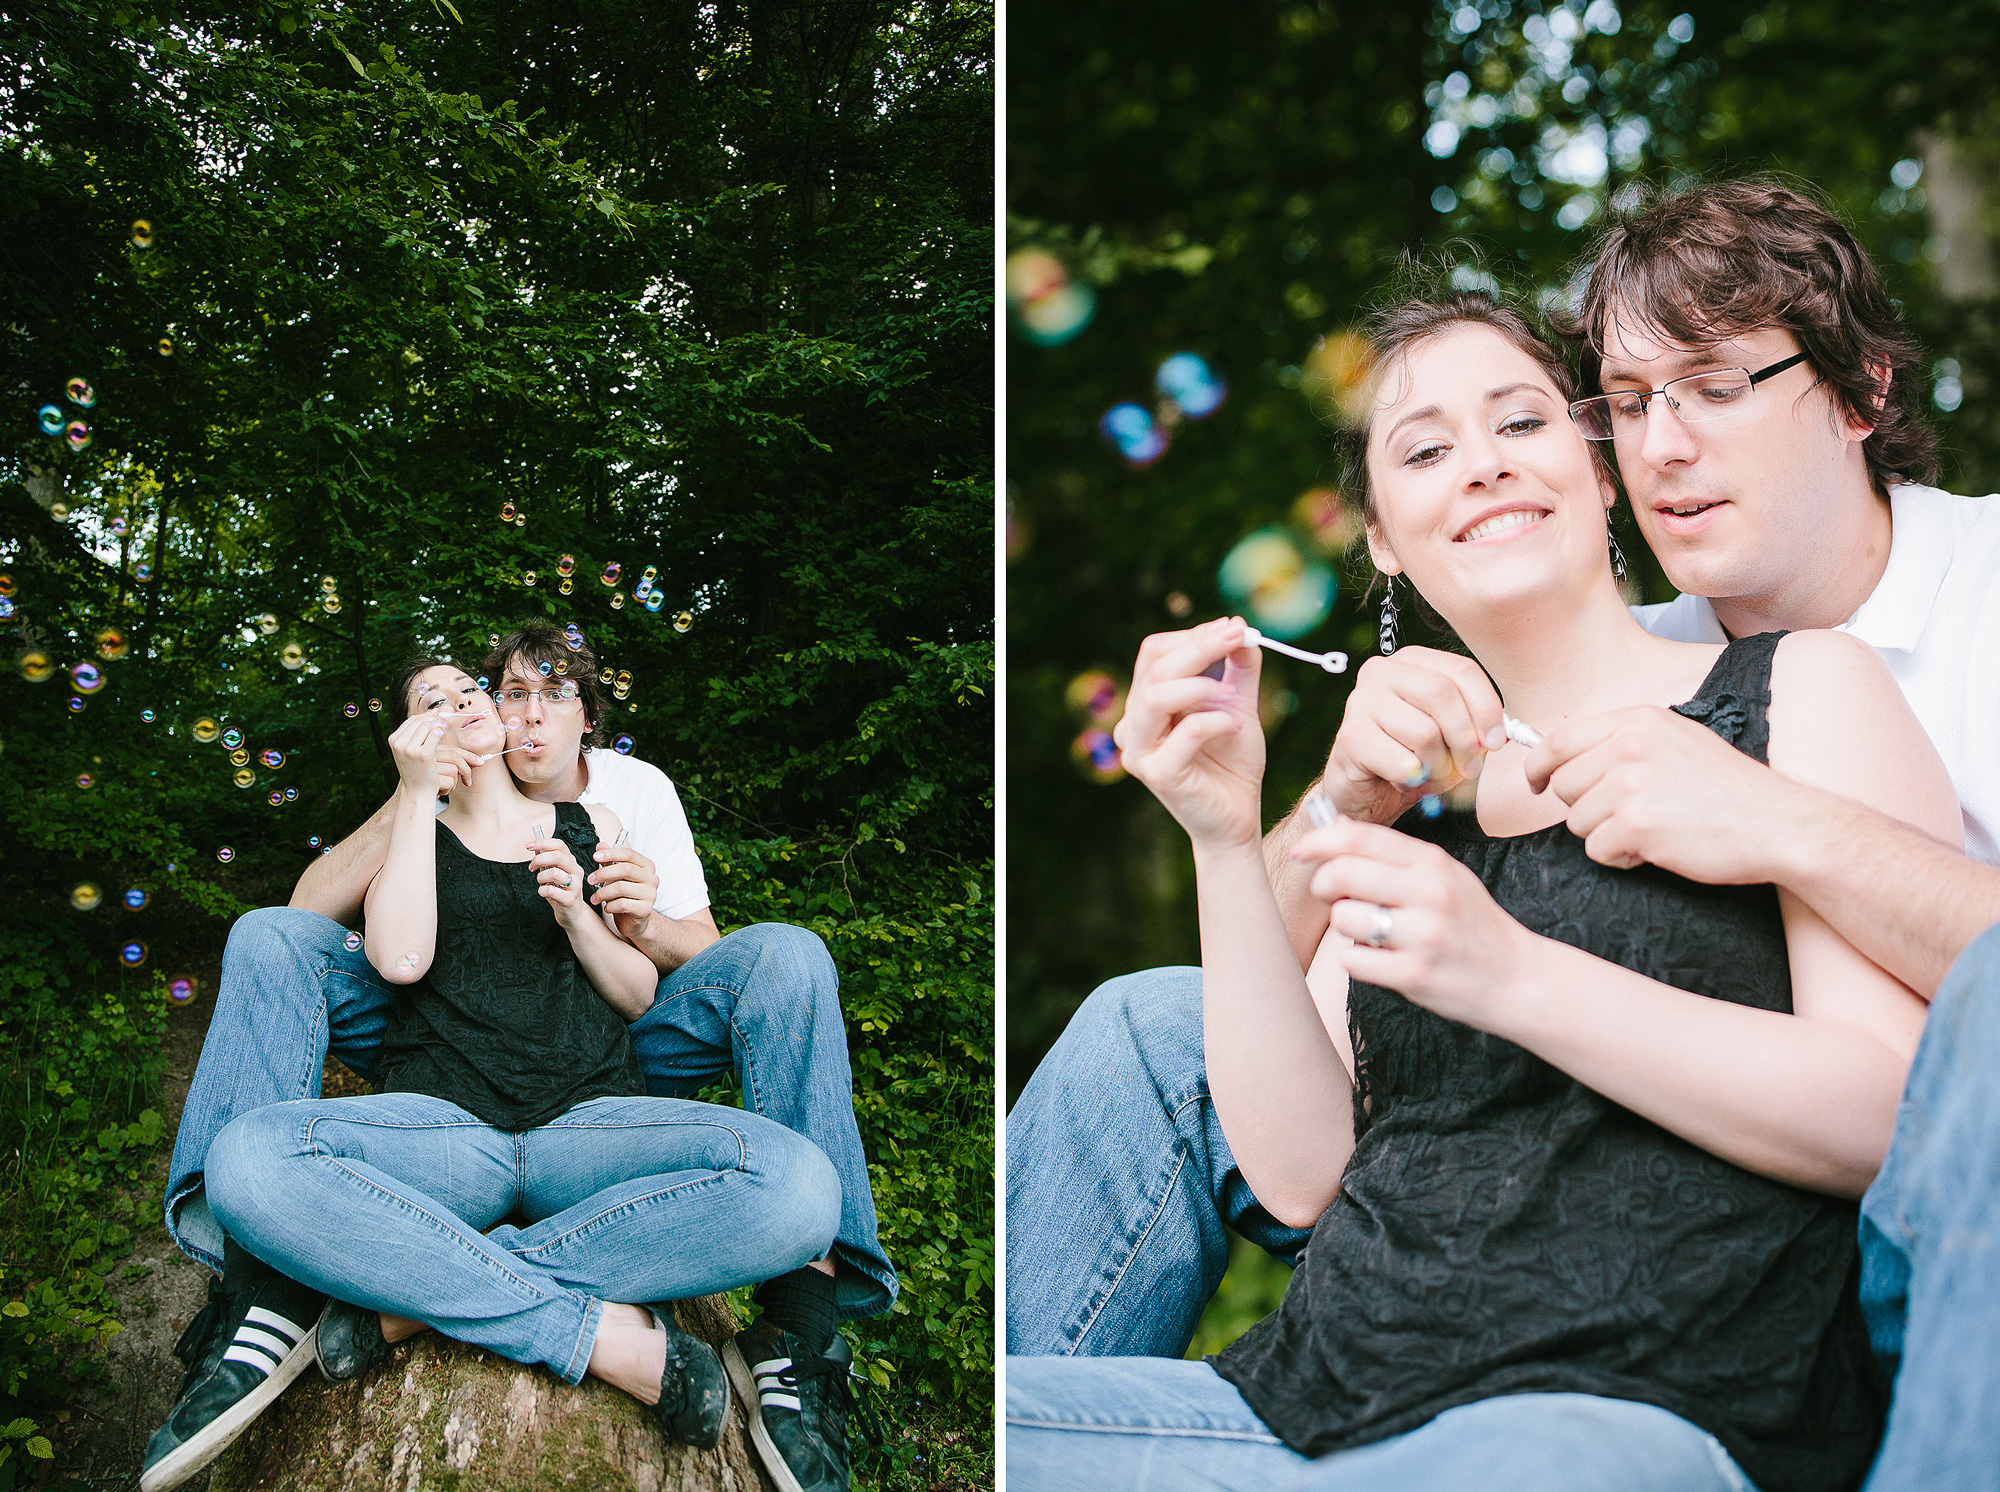 Ramona-und-Rafael-Engagement-Foto-Avec-Amis-87